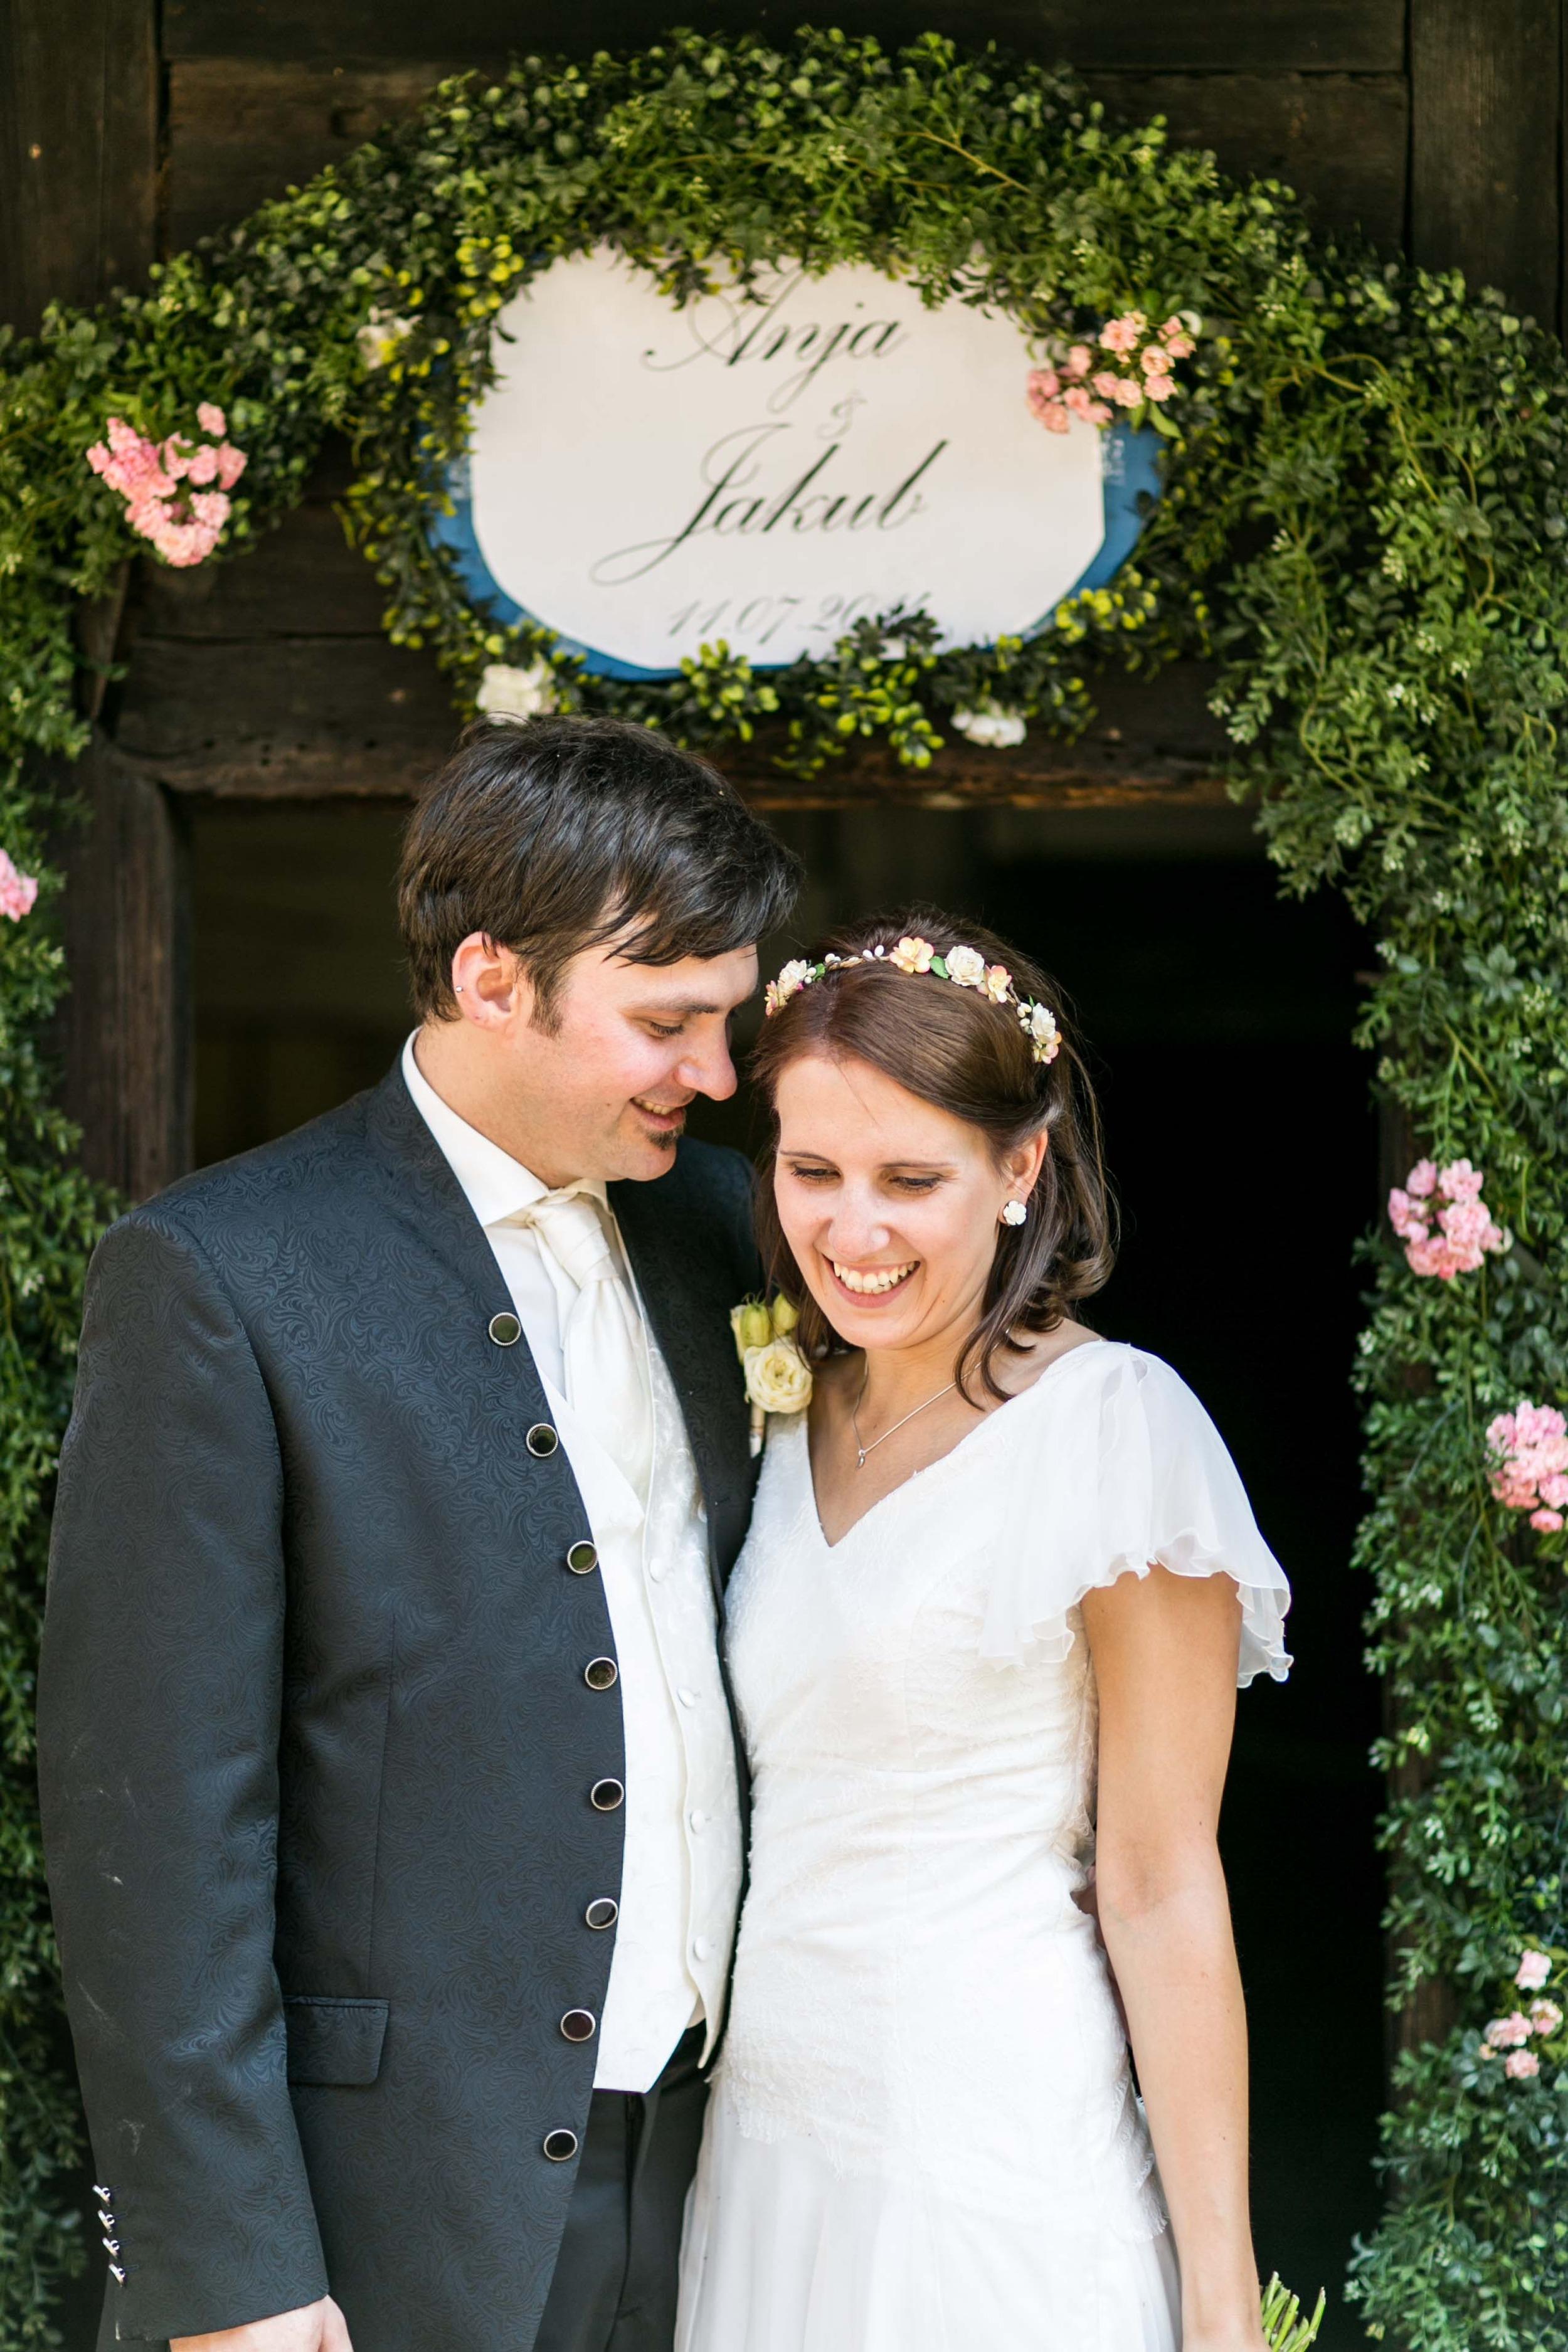 Spreewald Hochzeitsfotografie_Fran Burrows Fotografie-61.jpg